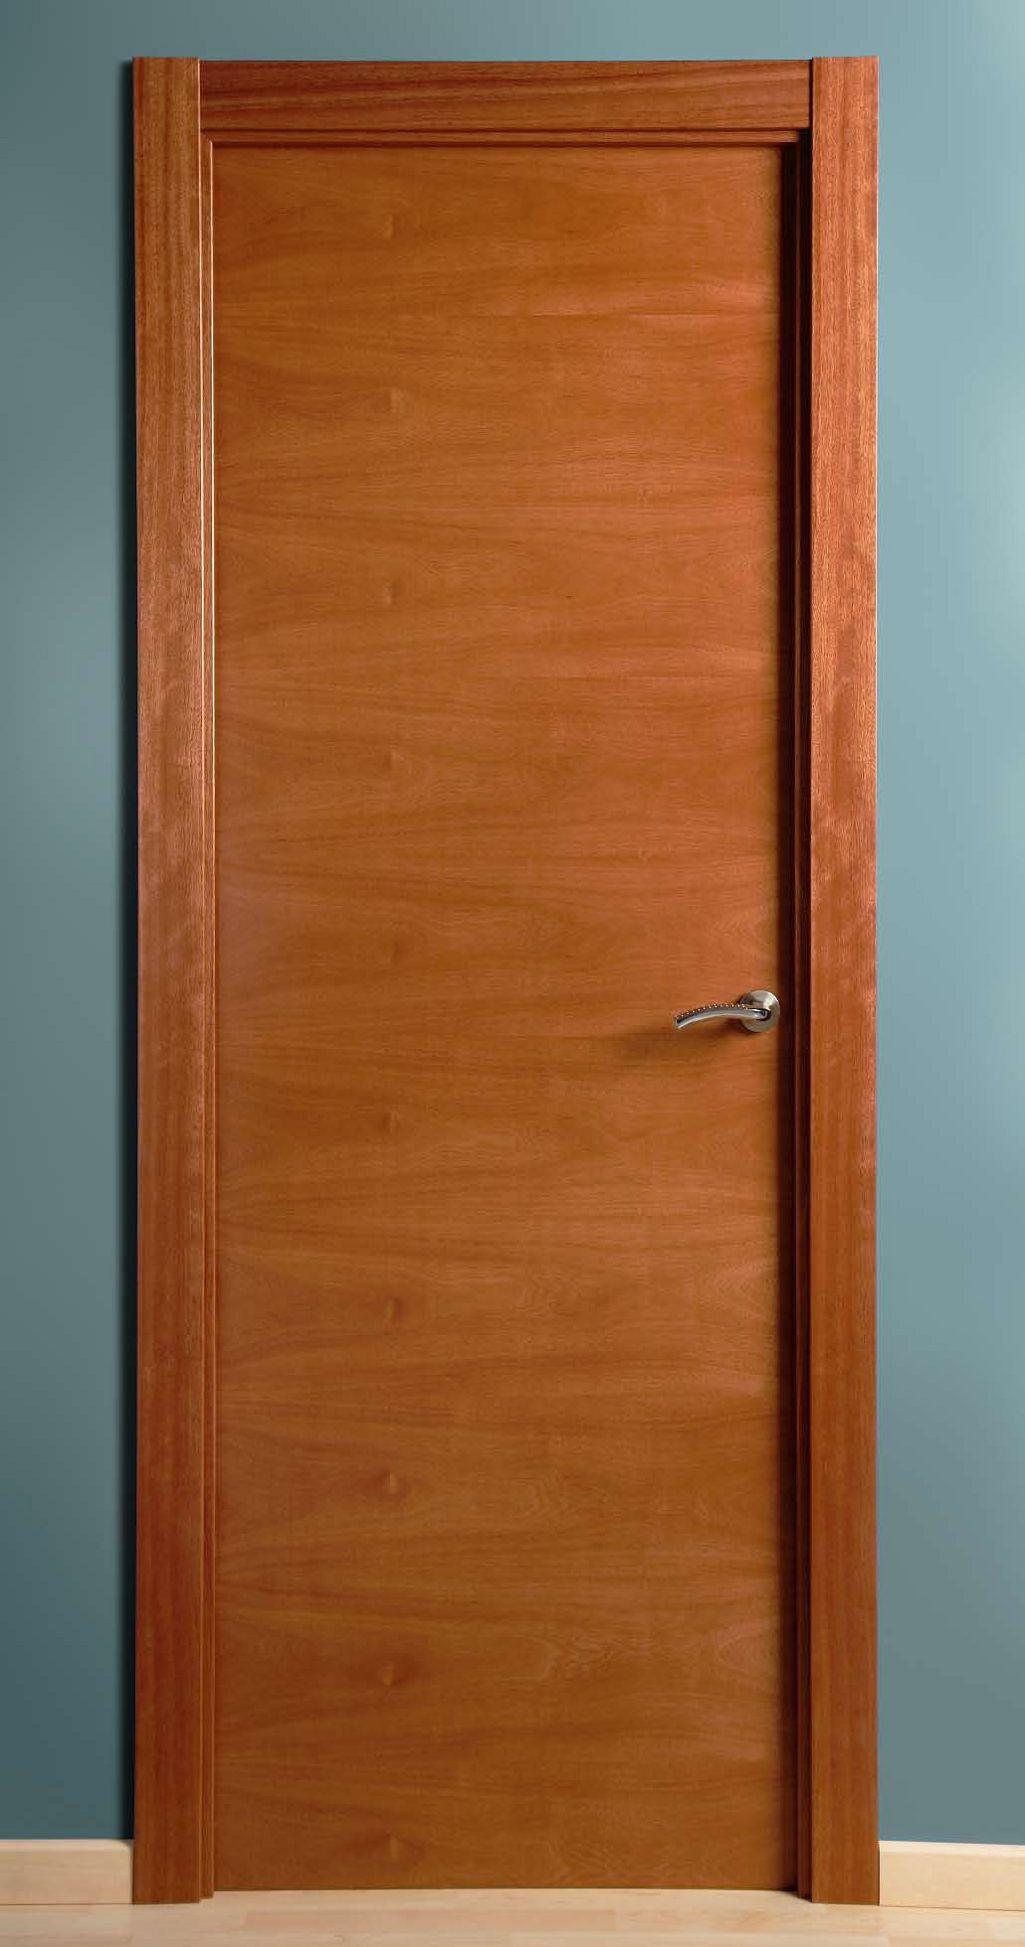 1 2 lisa maciza chapada en horizontal productos de for Modelos de puertas de madera